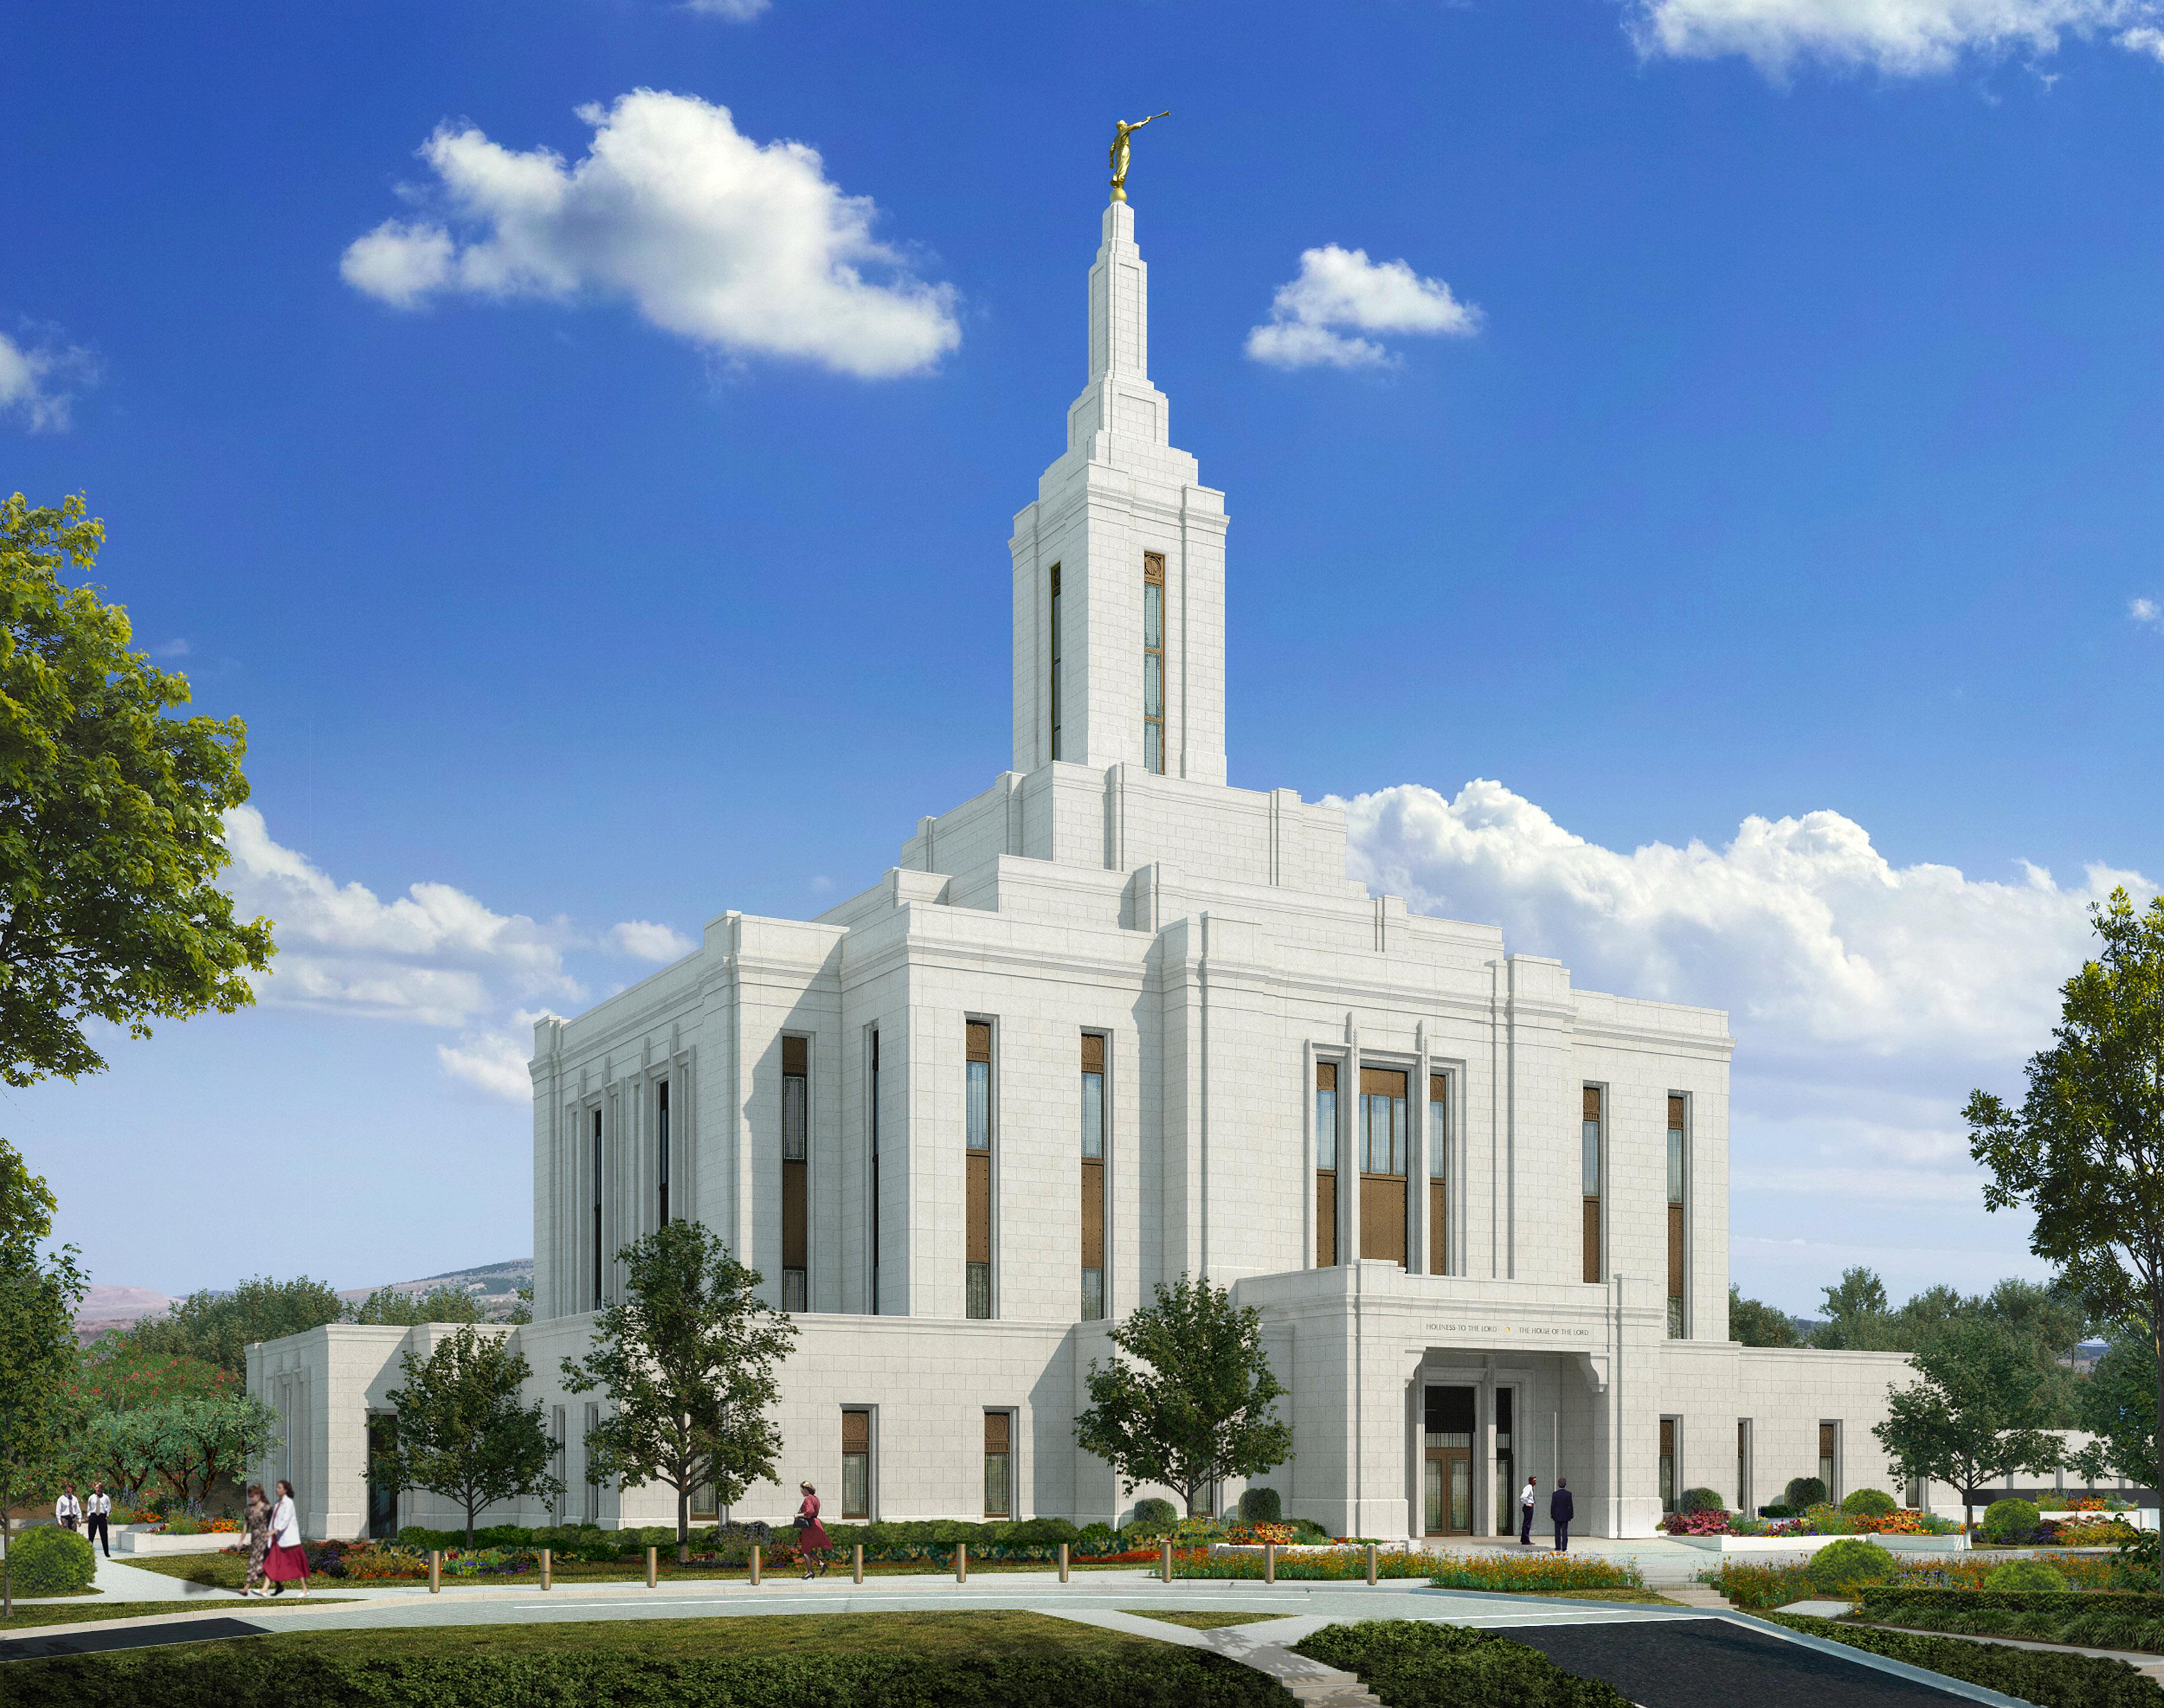 An artist rendering of the Pocatello Idaho Temple.